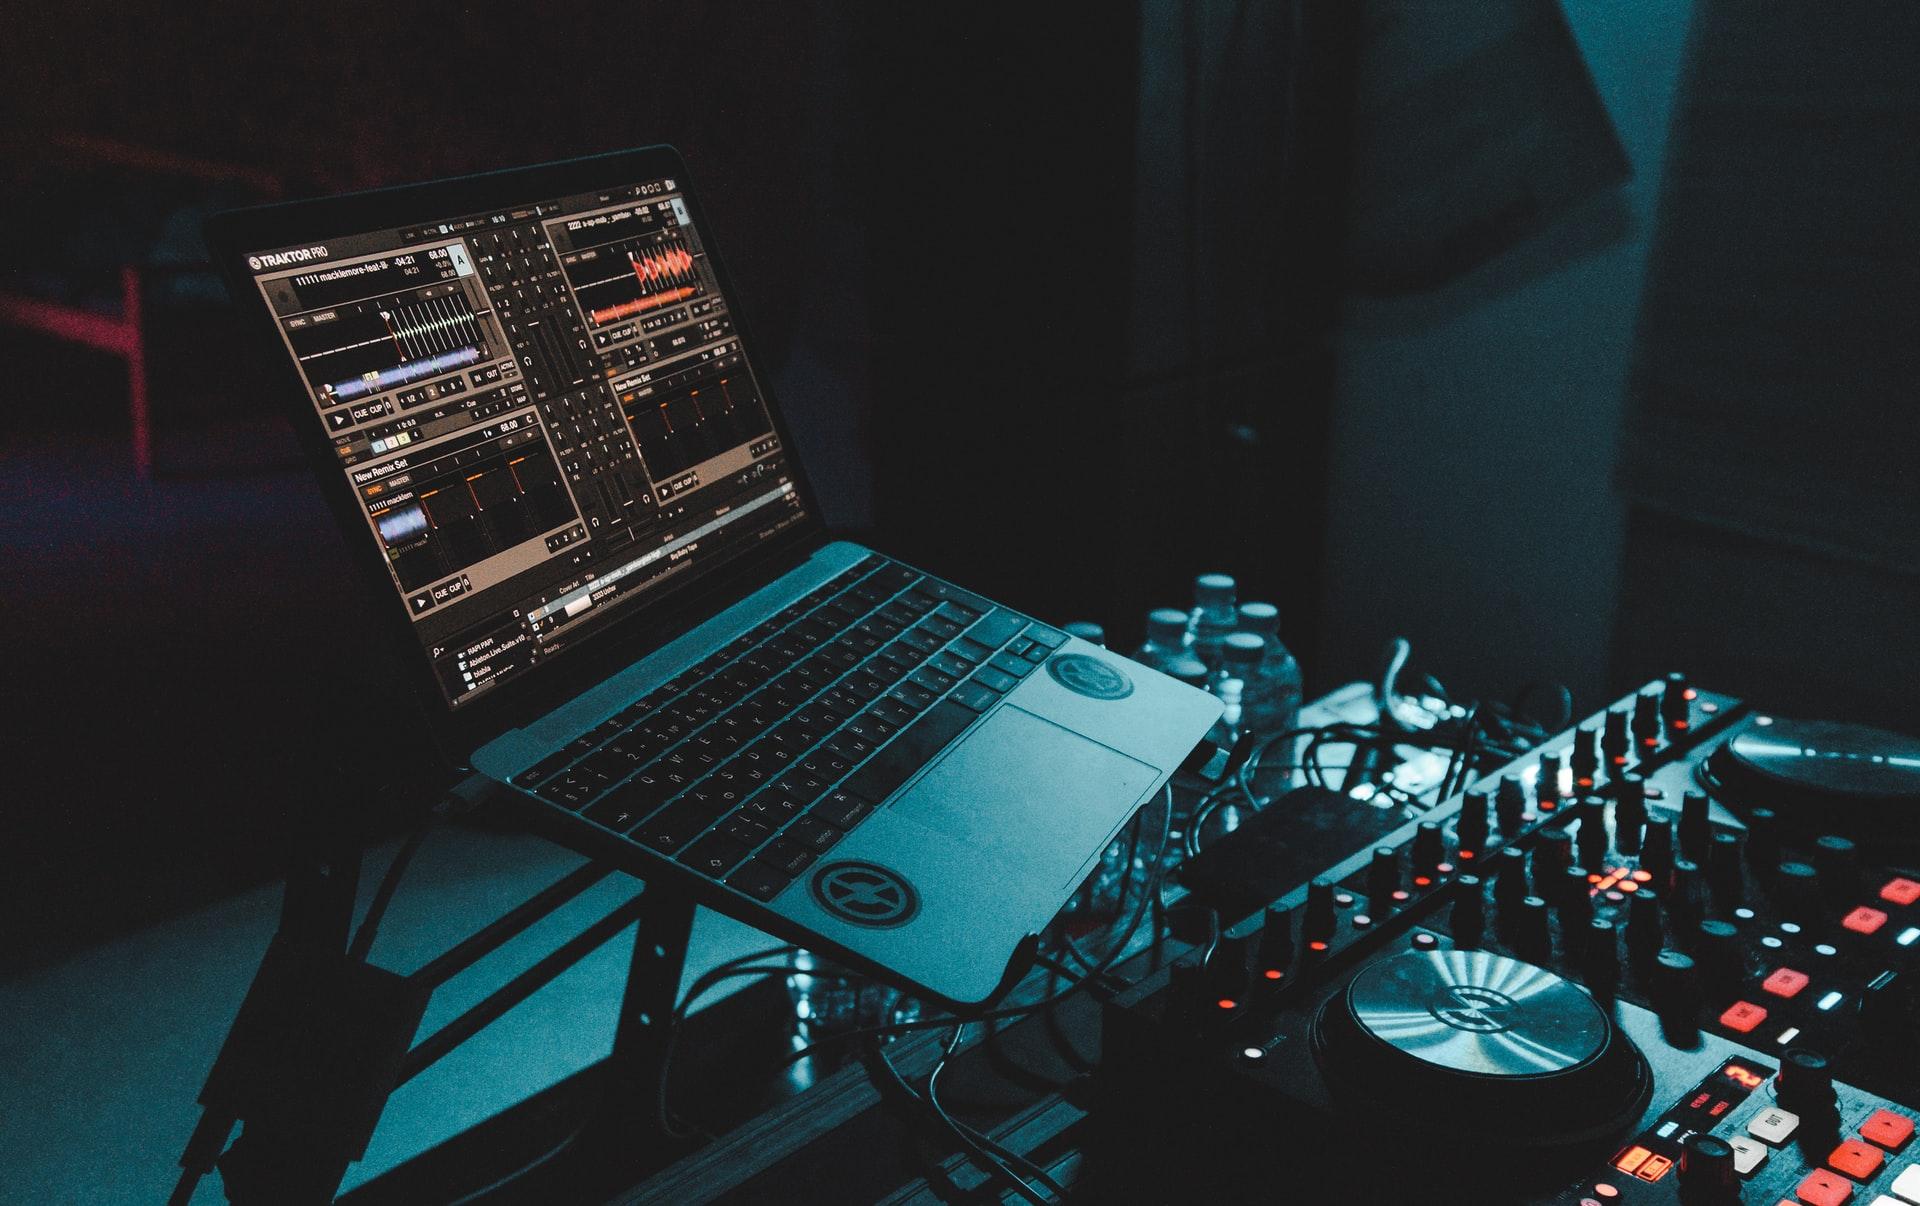 laptop and DJ equipment